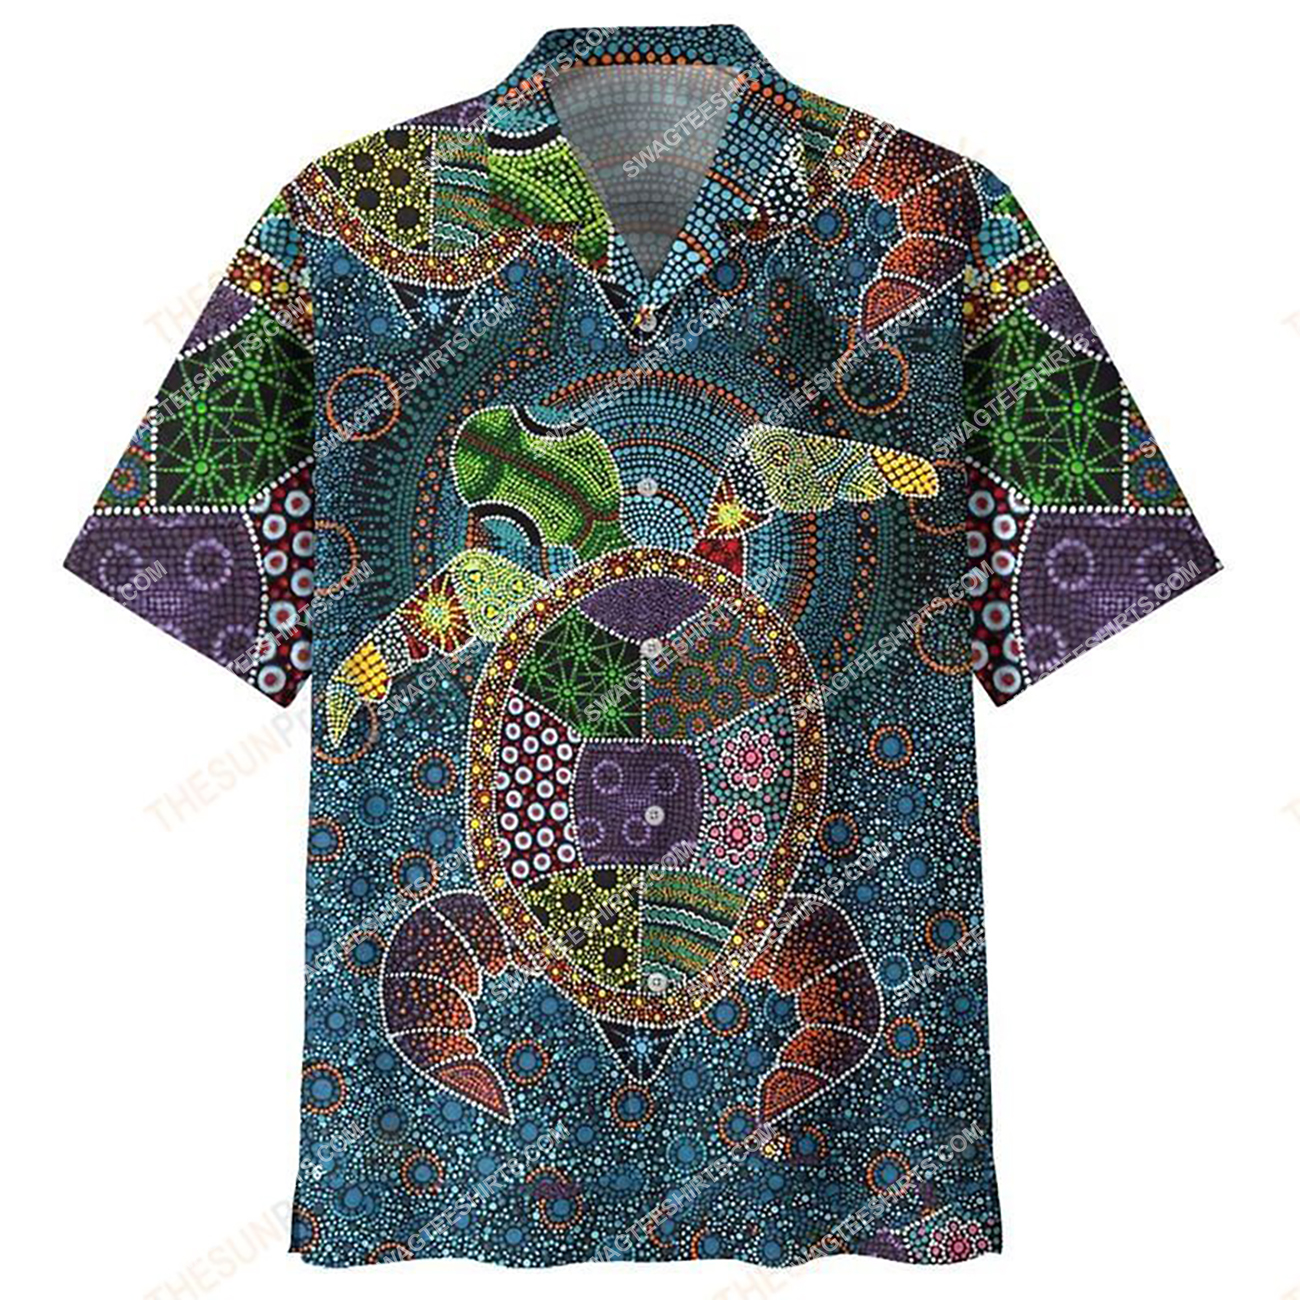 vintage sea turtle all over printed hawaiian shirt 1(3) - Copy